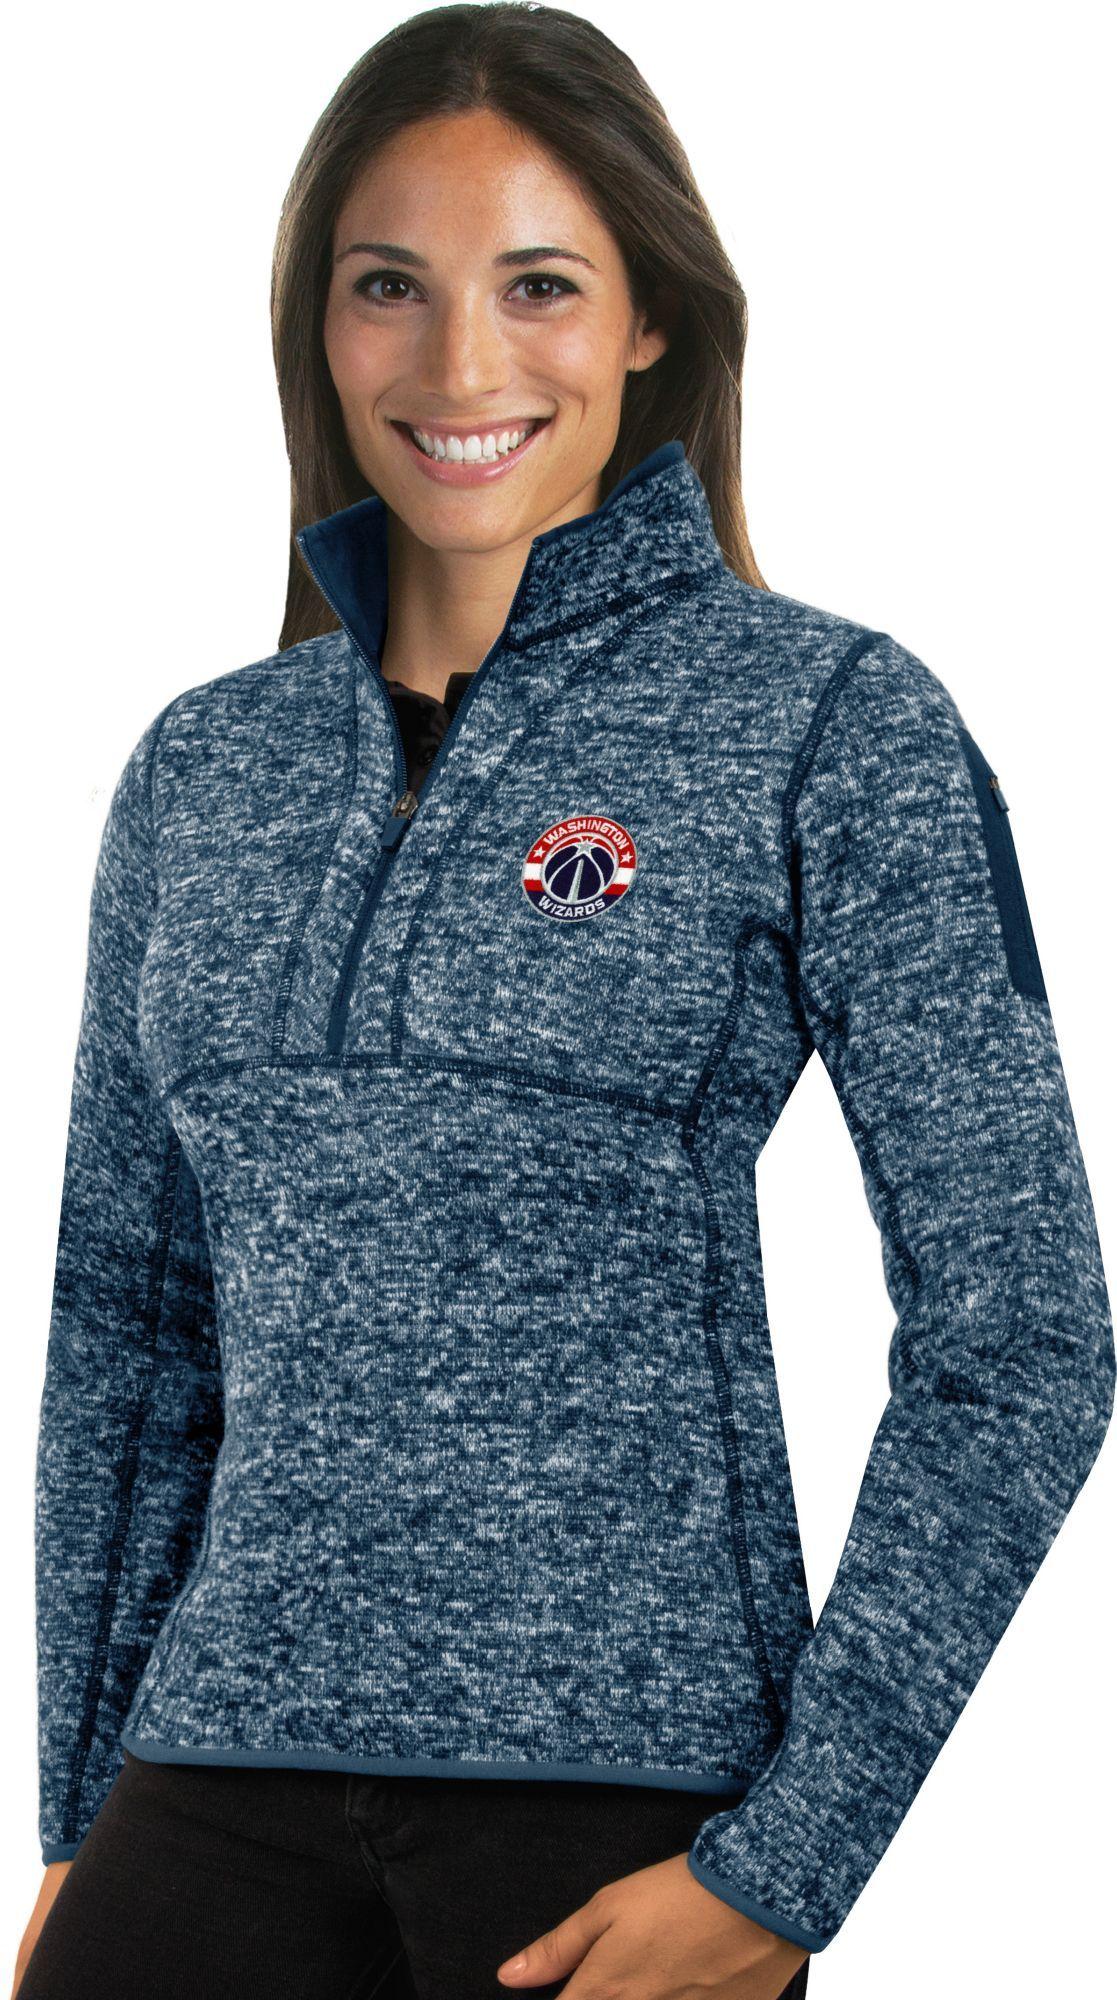 c28d6235 Antigua Women's Washington Wizards Fortune Navy Half-Zip Pullover, Size:  Medium, Team